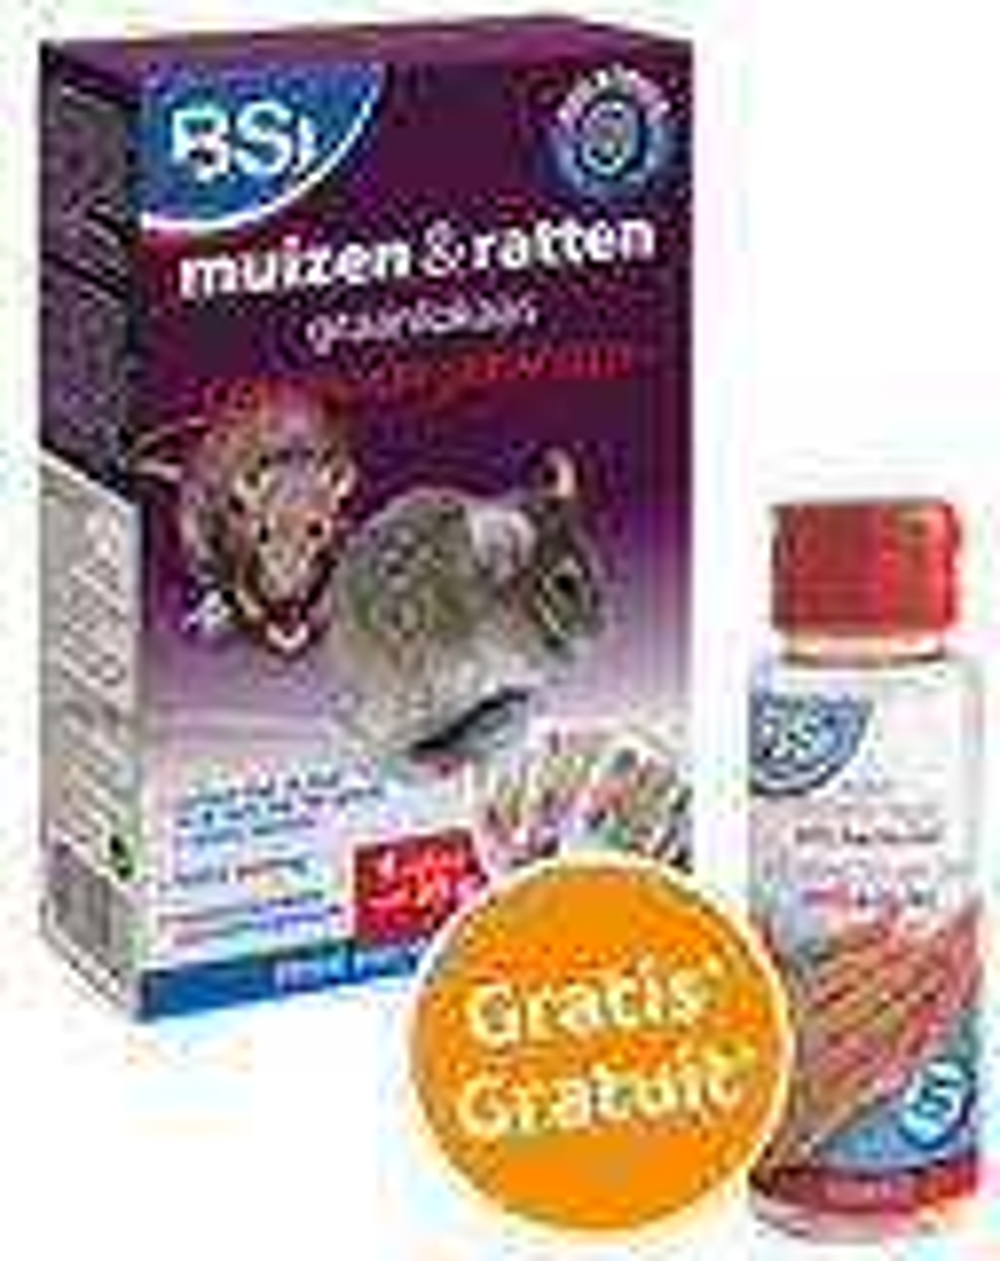 Generation Grain'Tech 150 gr muizen- en rattenvergif